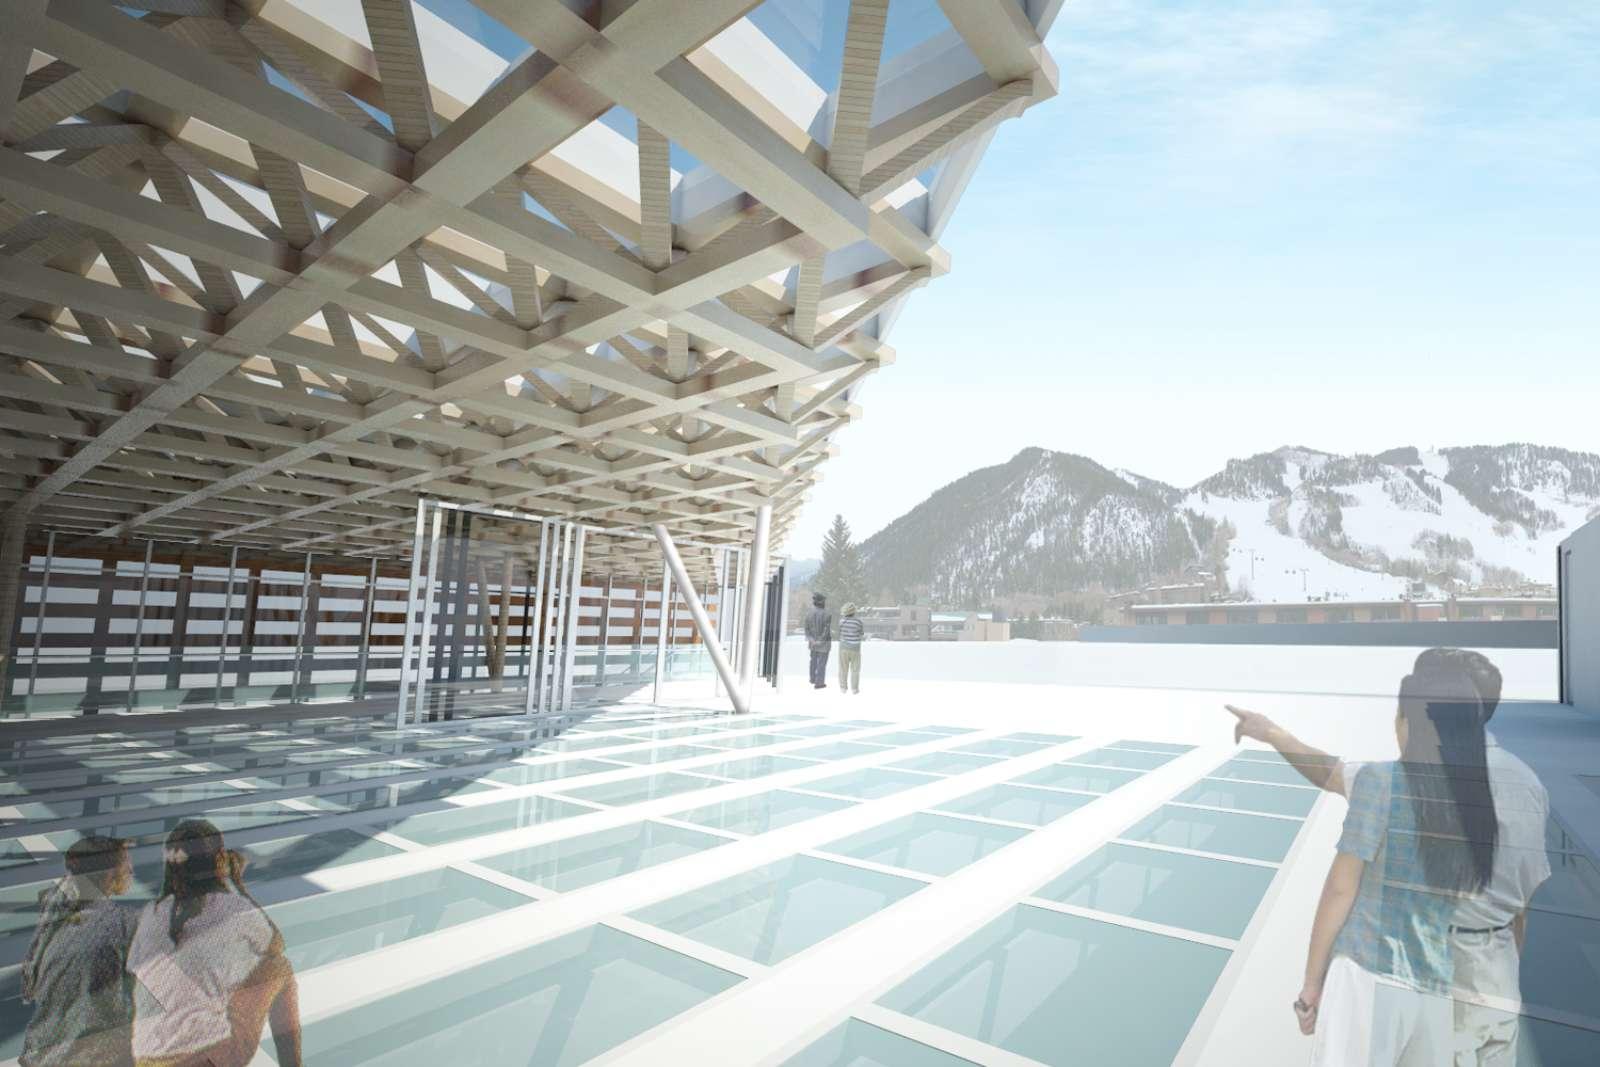 02-Aspen-Art-Museum por Shigeru Ban---junto abierto-verano